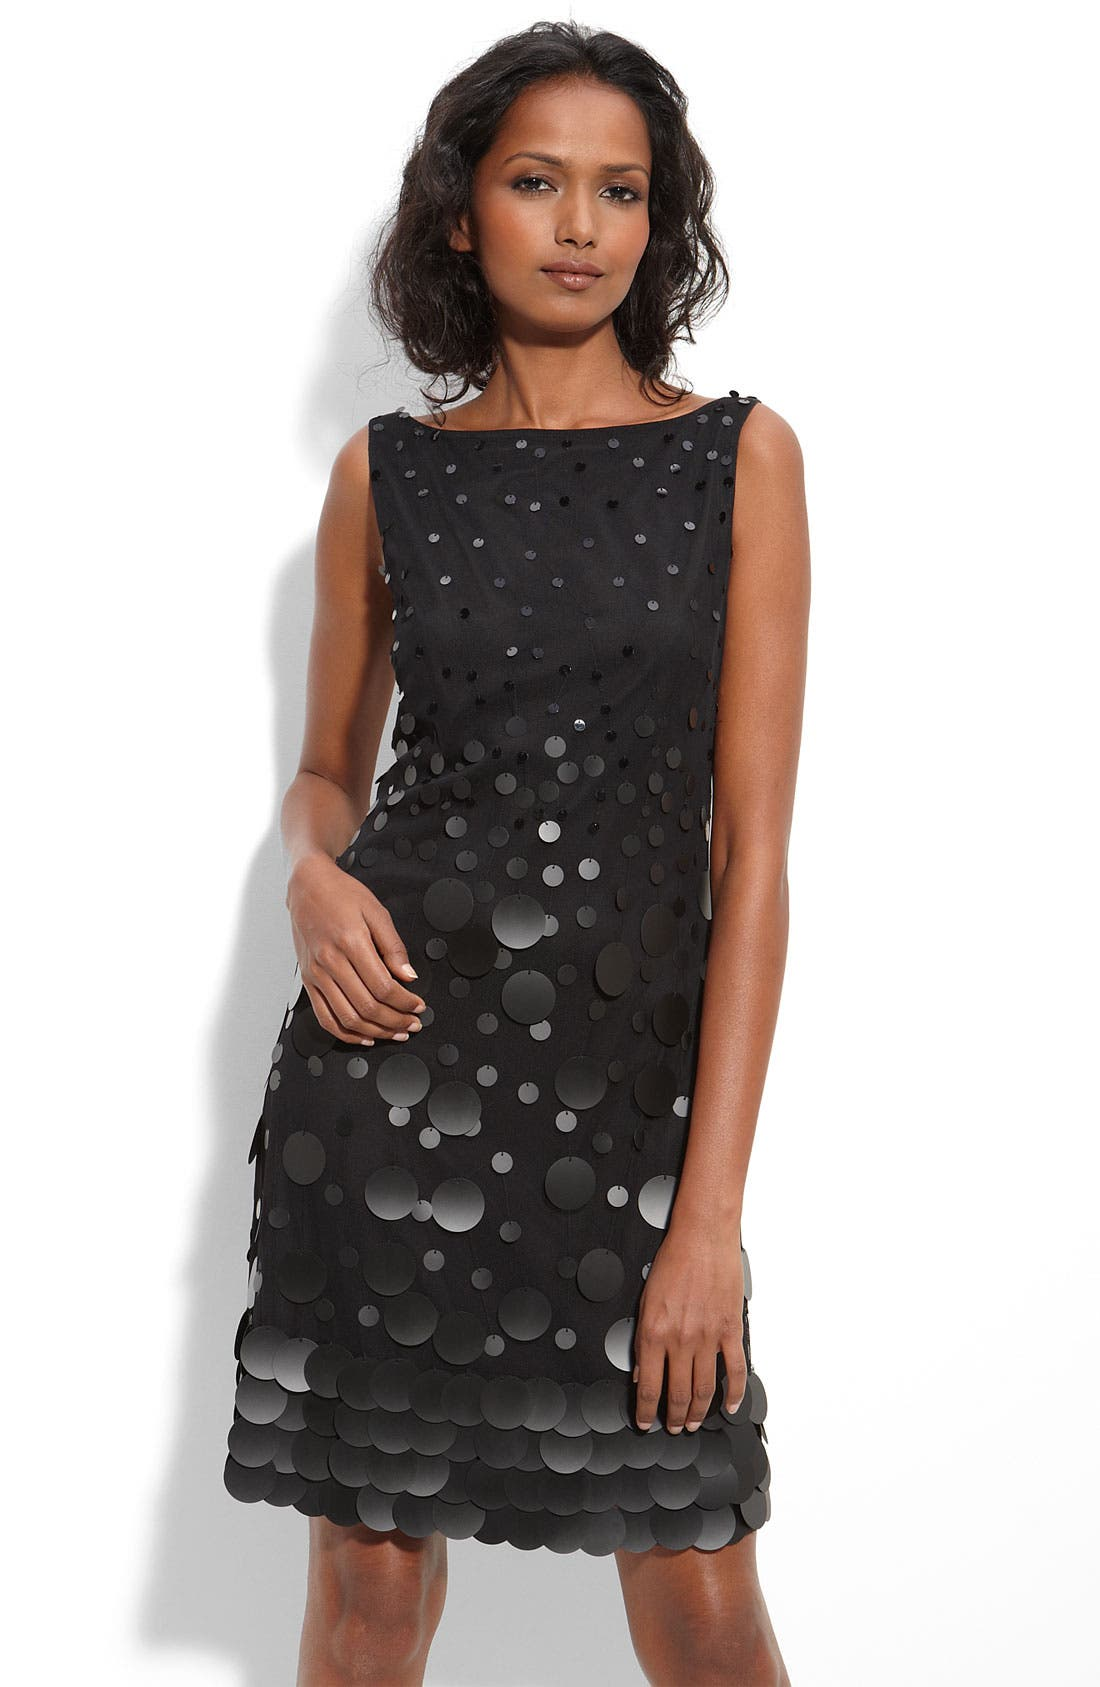 Alternate Image 1 Selected - Jessica Simpson Graduated Paillette Shift Dress